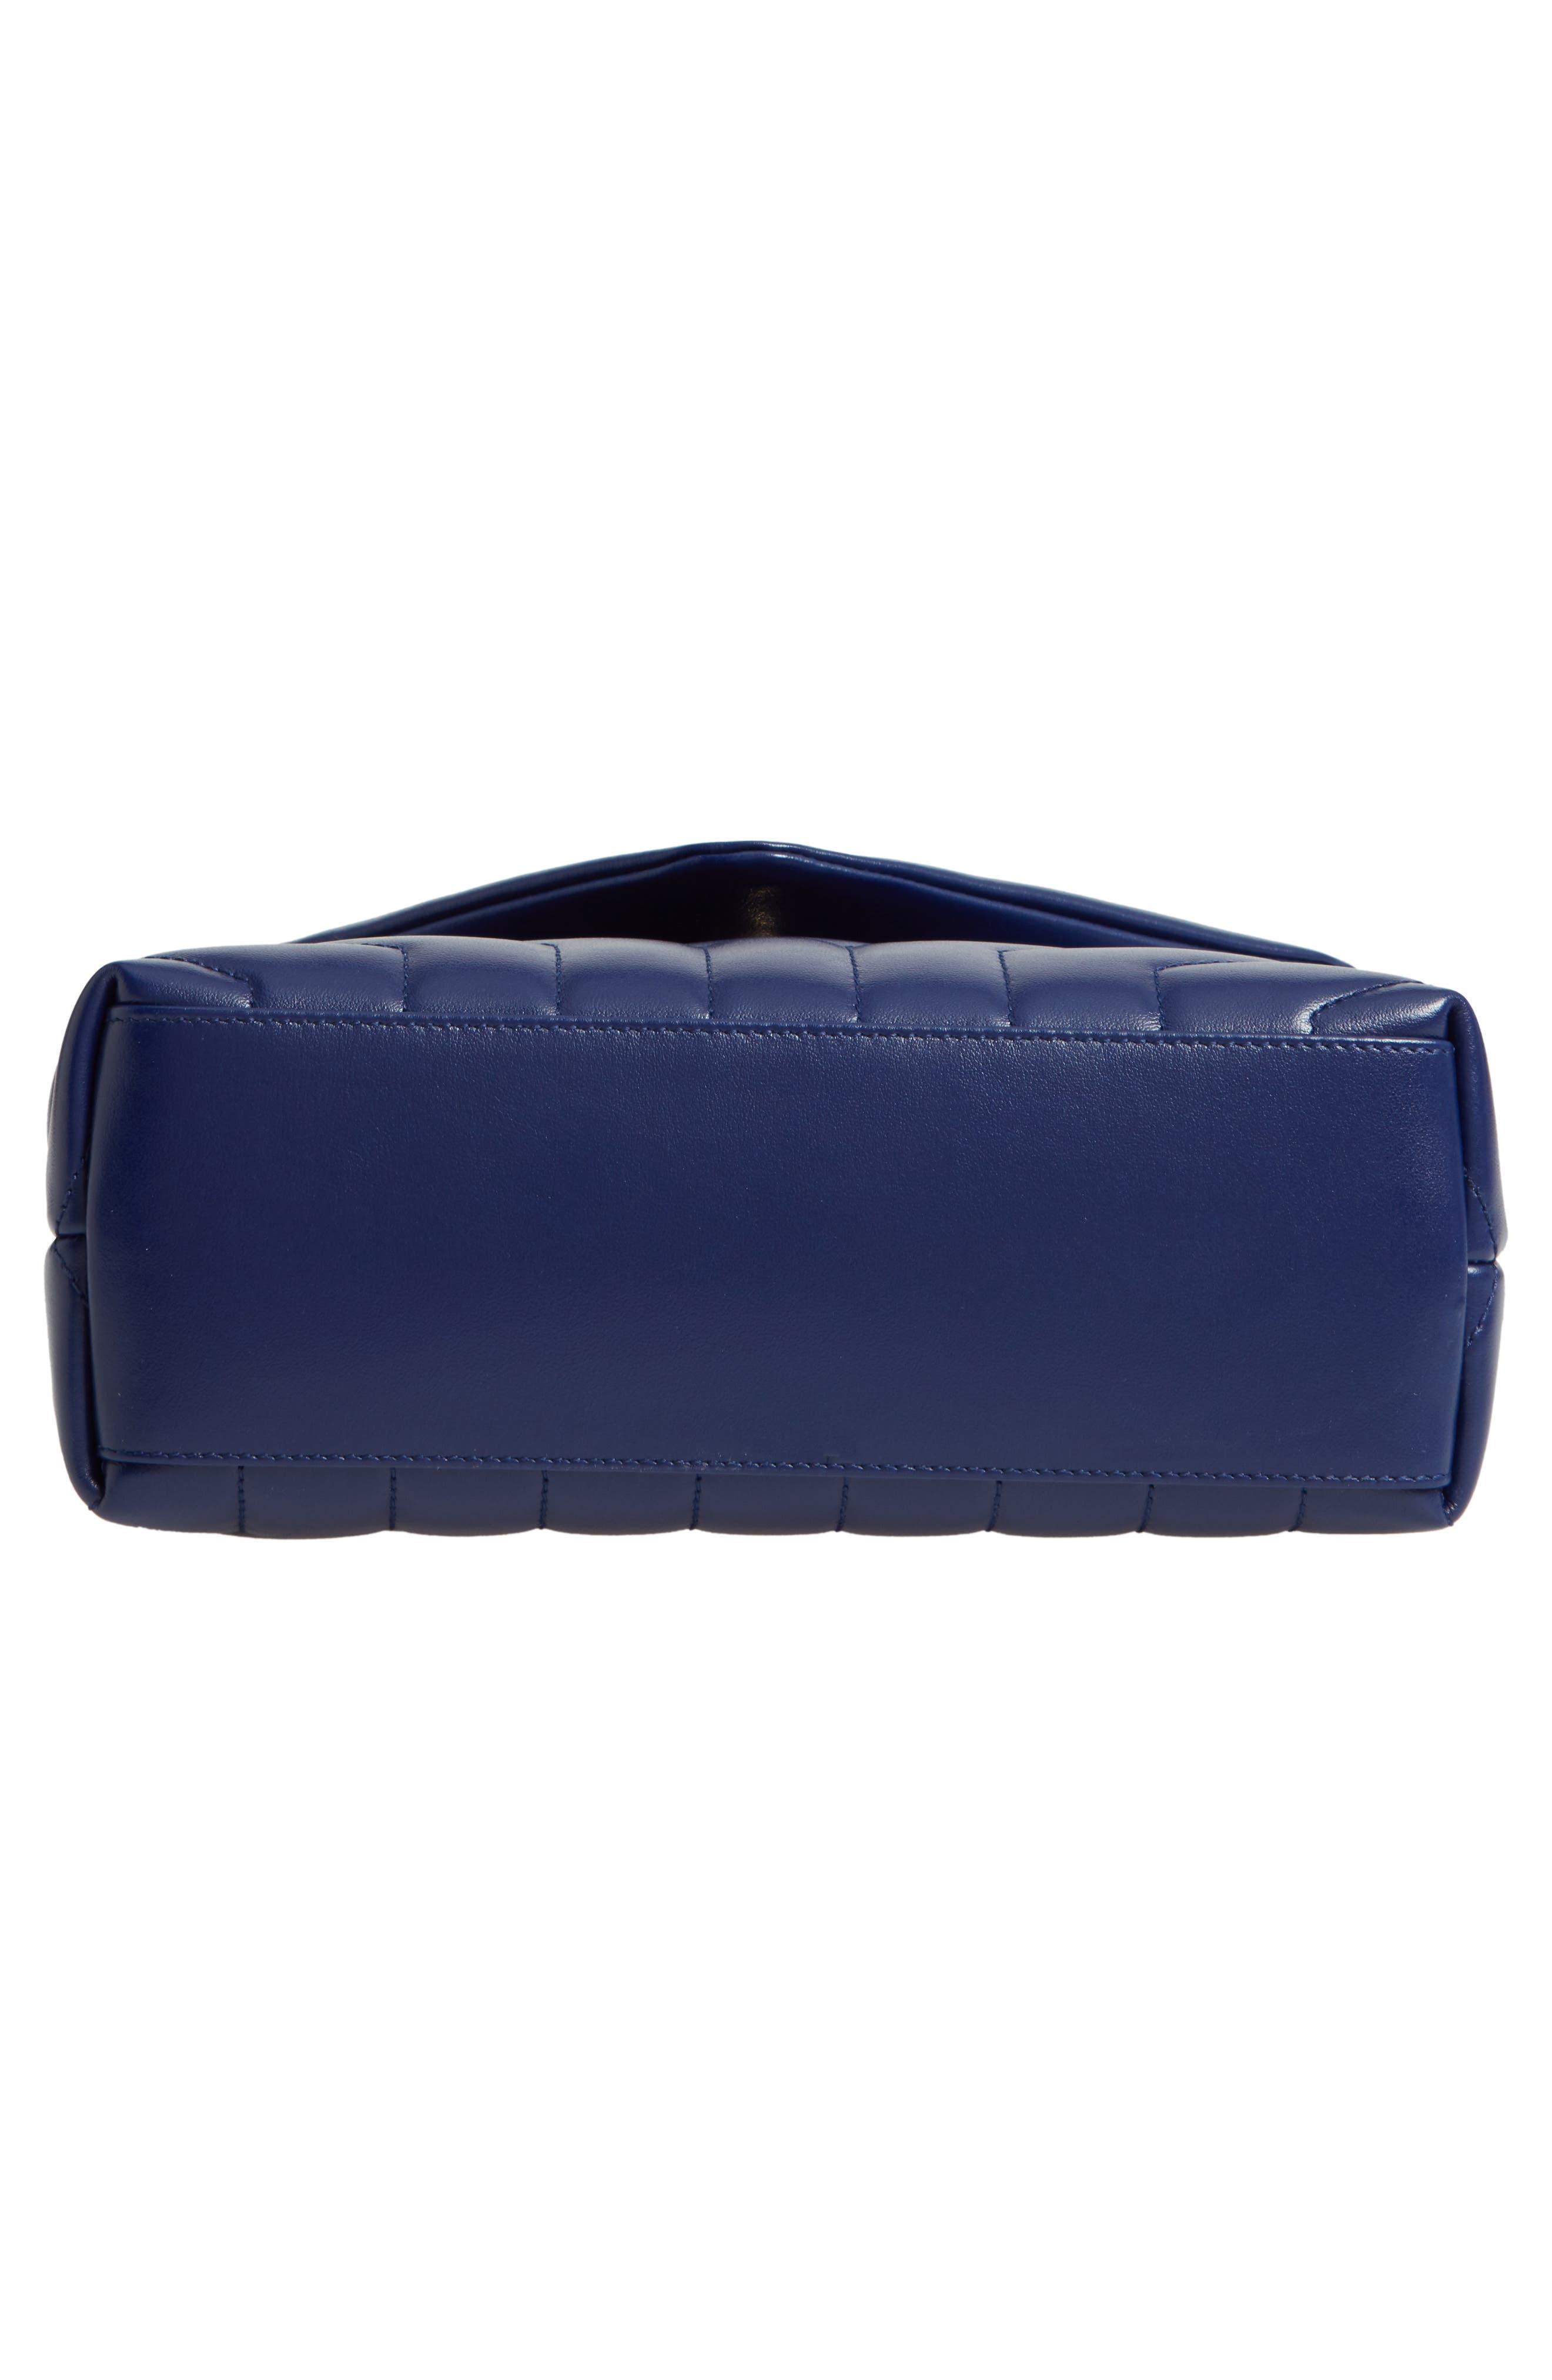 ,                             Small Loulou Leather Shoulder Bag,                             Alternate thumbnail 27, color,                             402